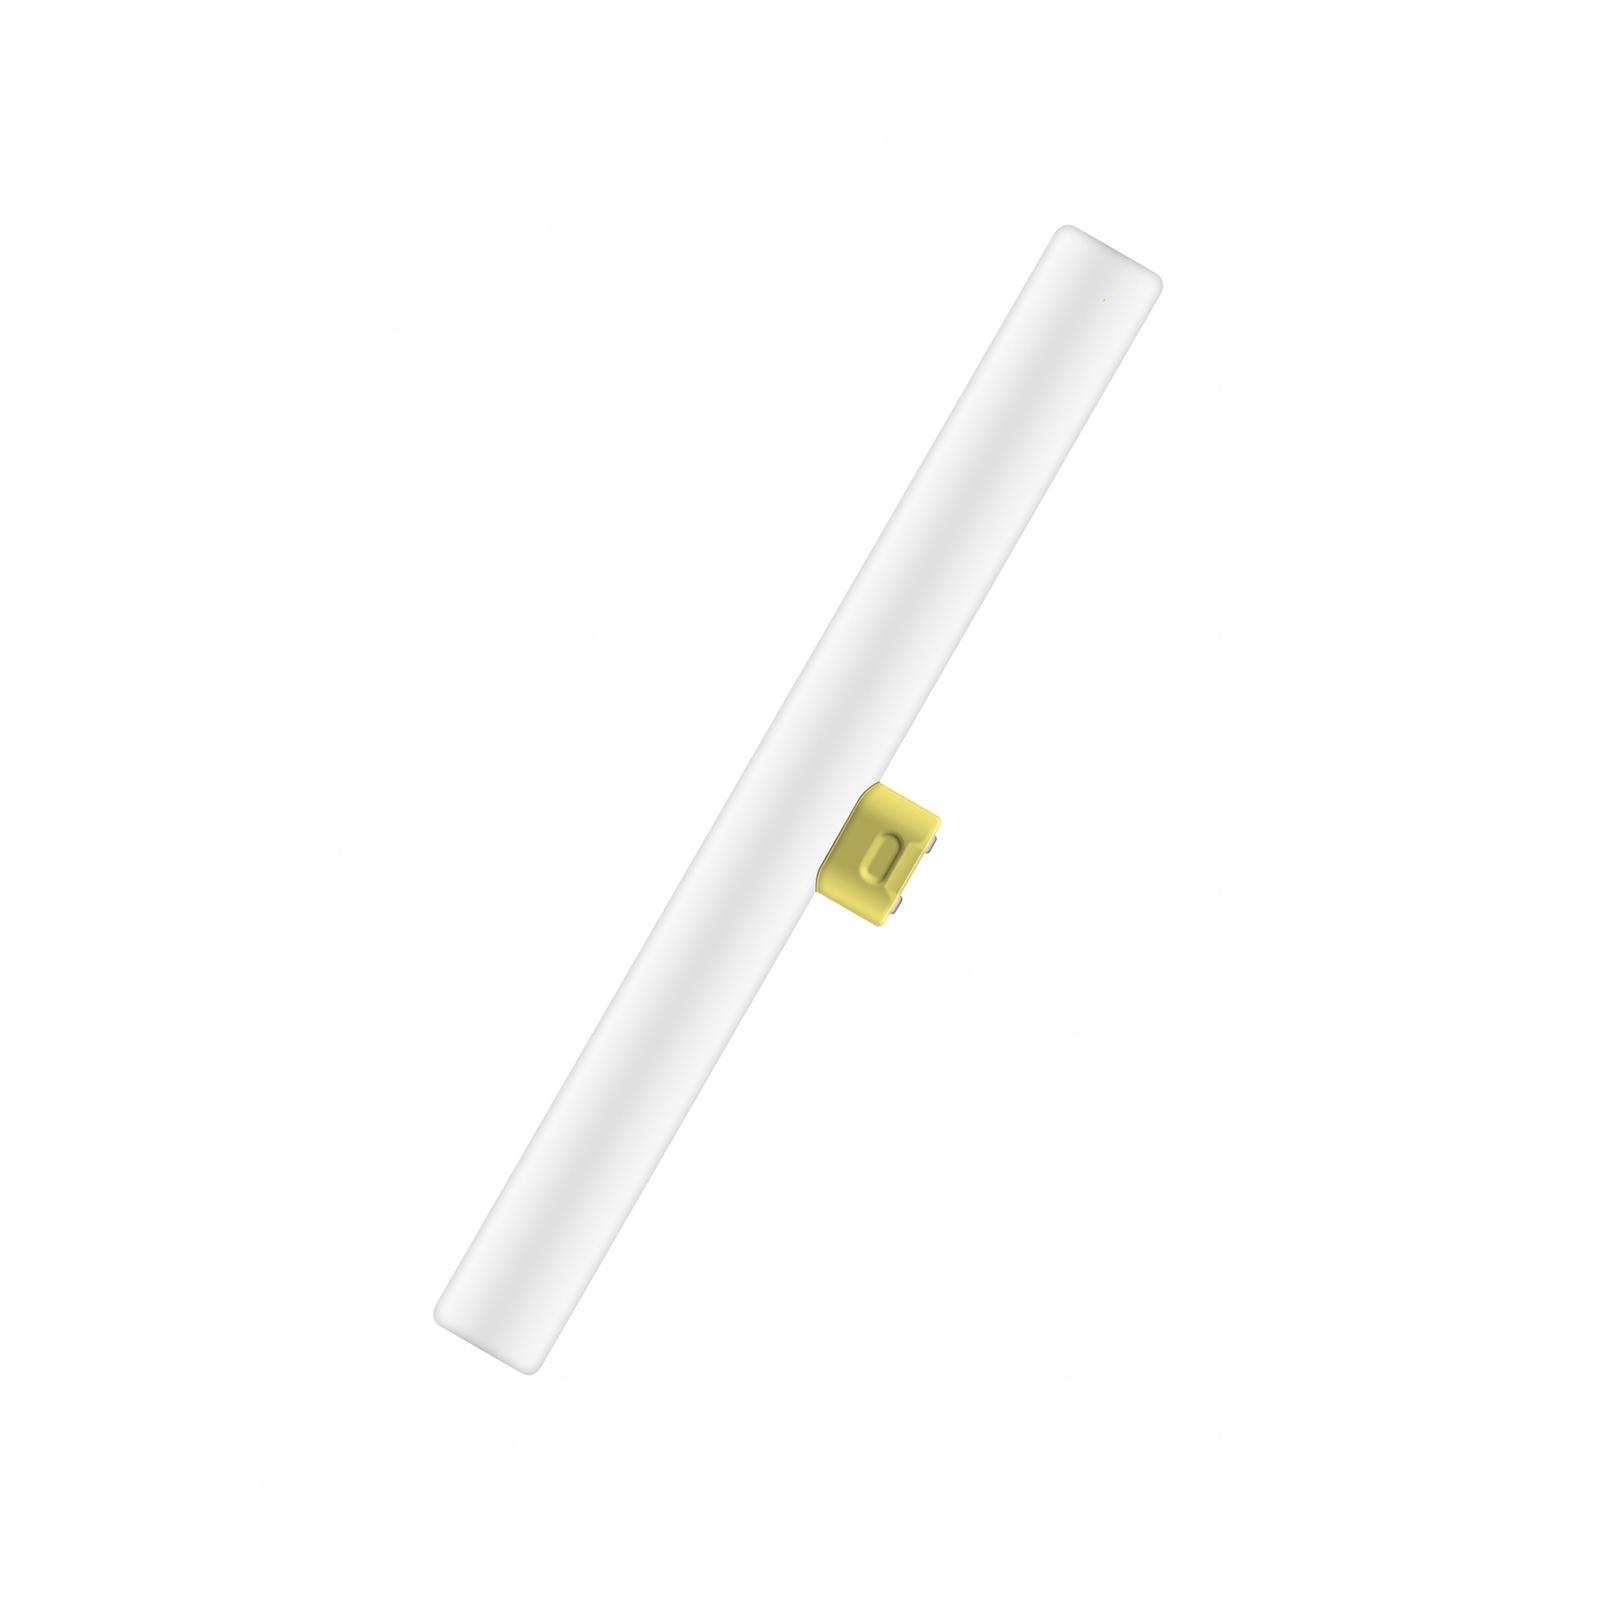 OSRAM LED-Linienlampe S14d 3,2W 2.700K matt